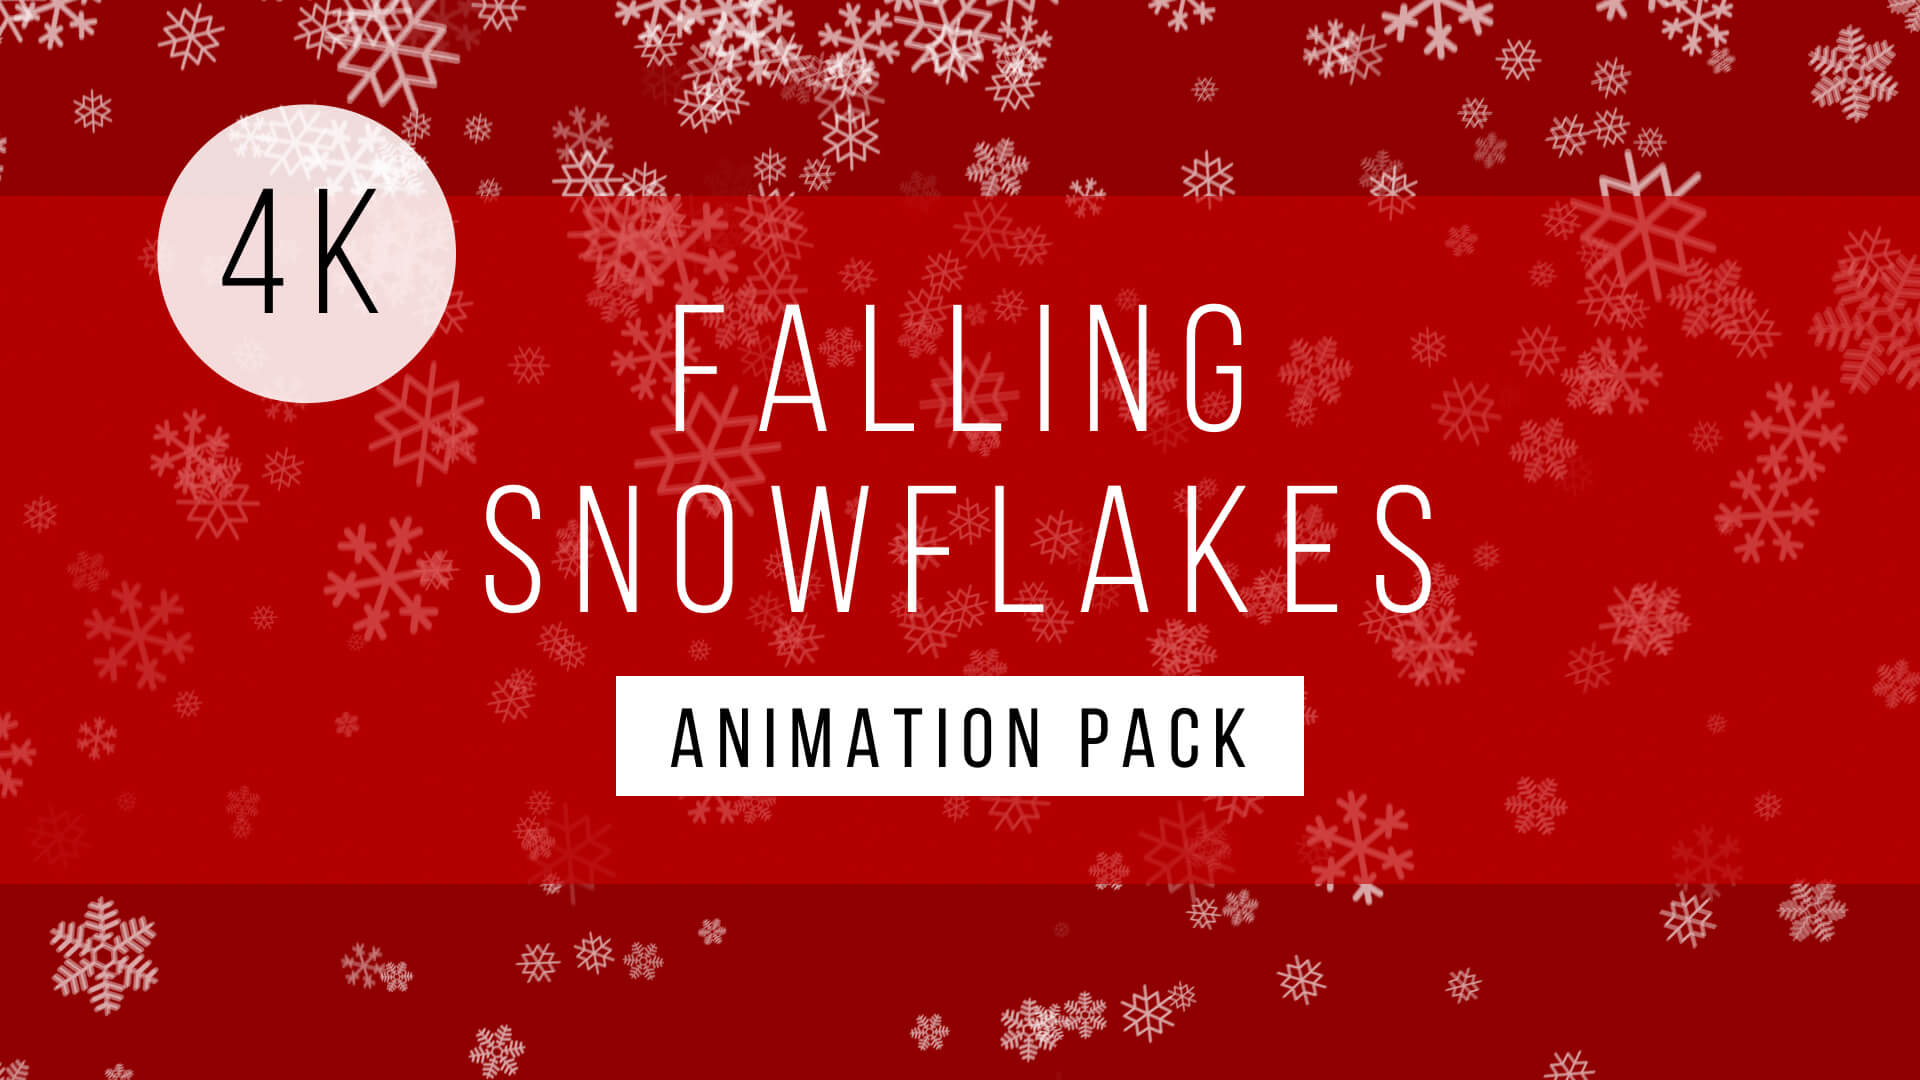 Falling Snowflake Background Animation Pack